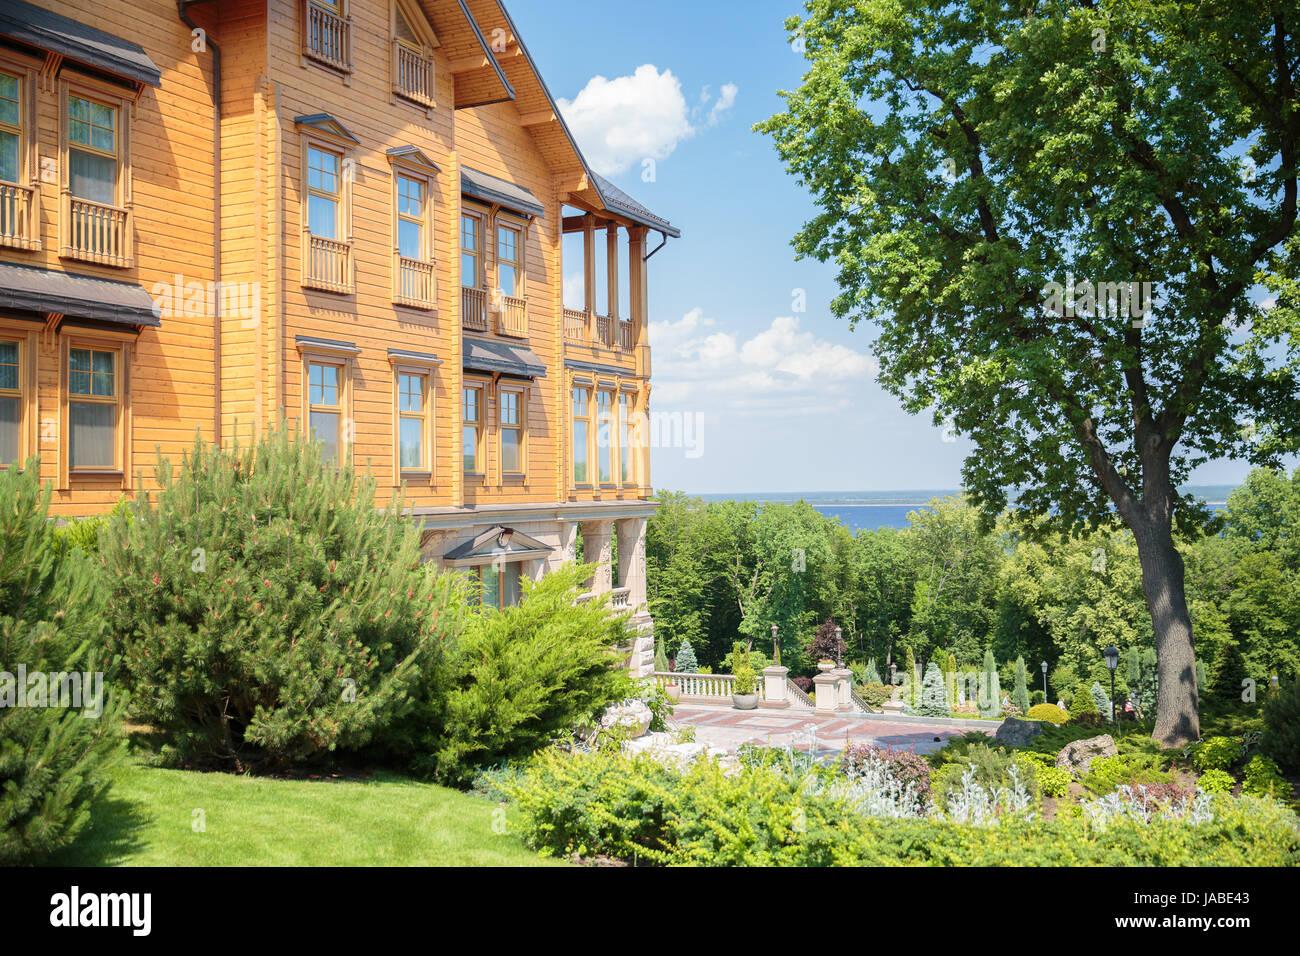 Gran Casa De Madera Mejigorye Honka Frame Foto Imagen De Stock